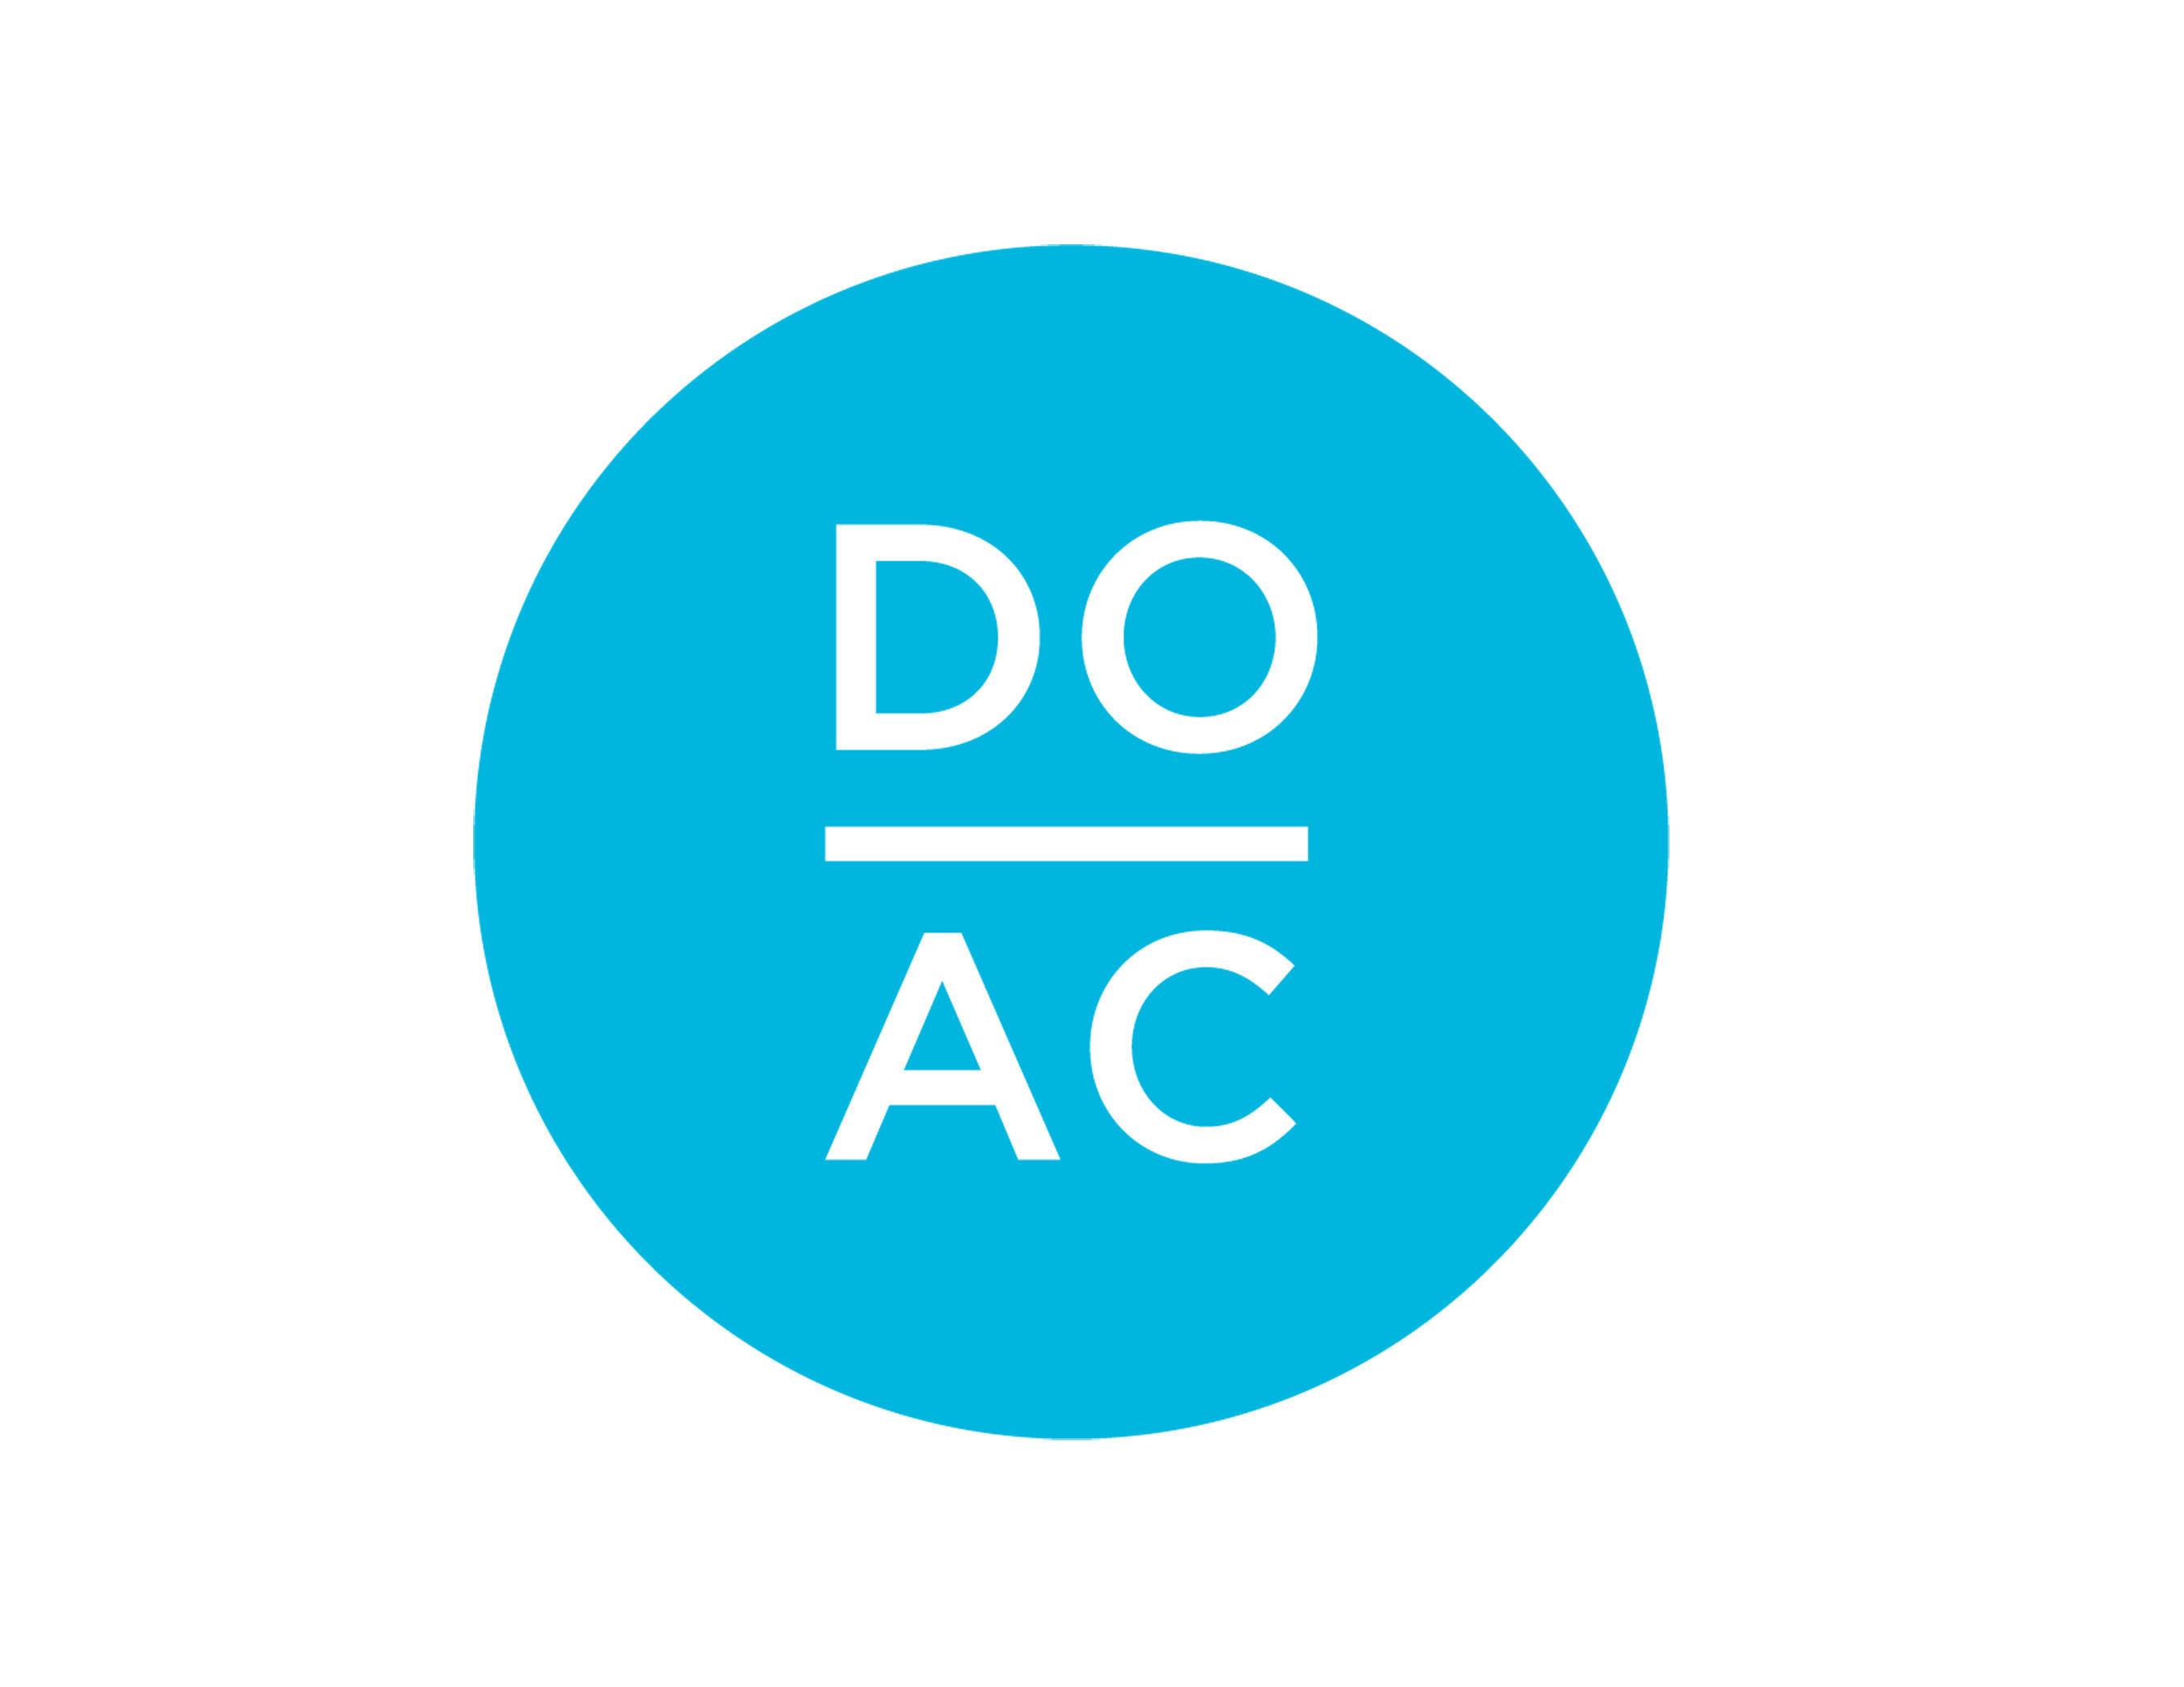 Atlantic City Hosts DO AC Pro Beach Volleyball Invitational Today